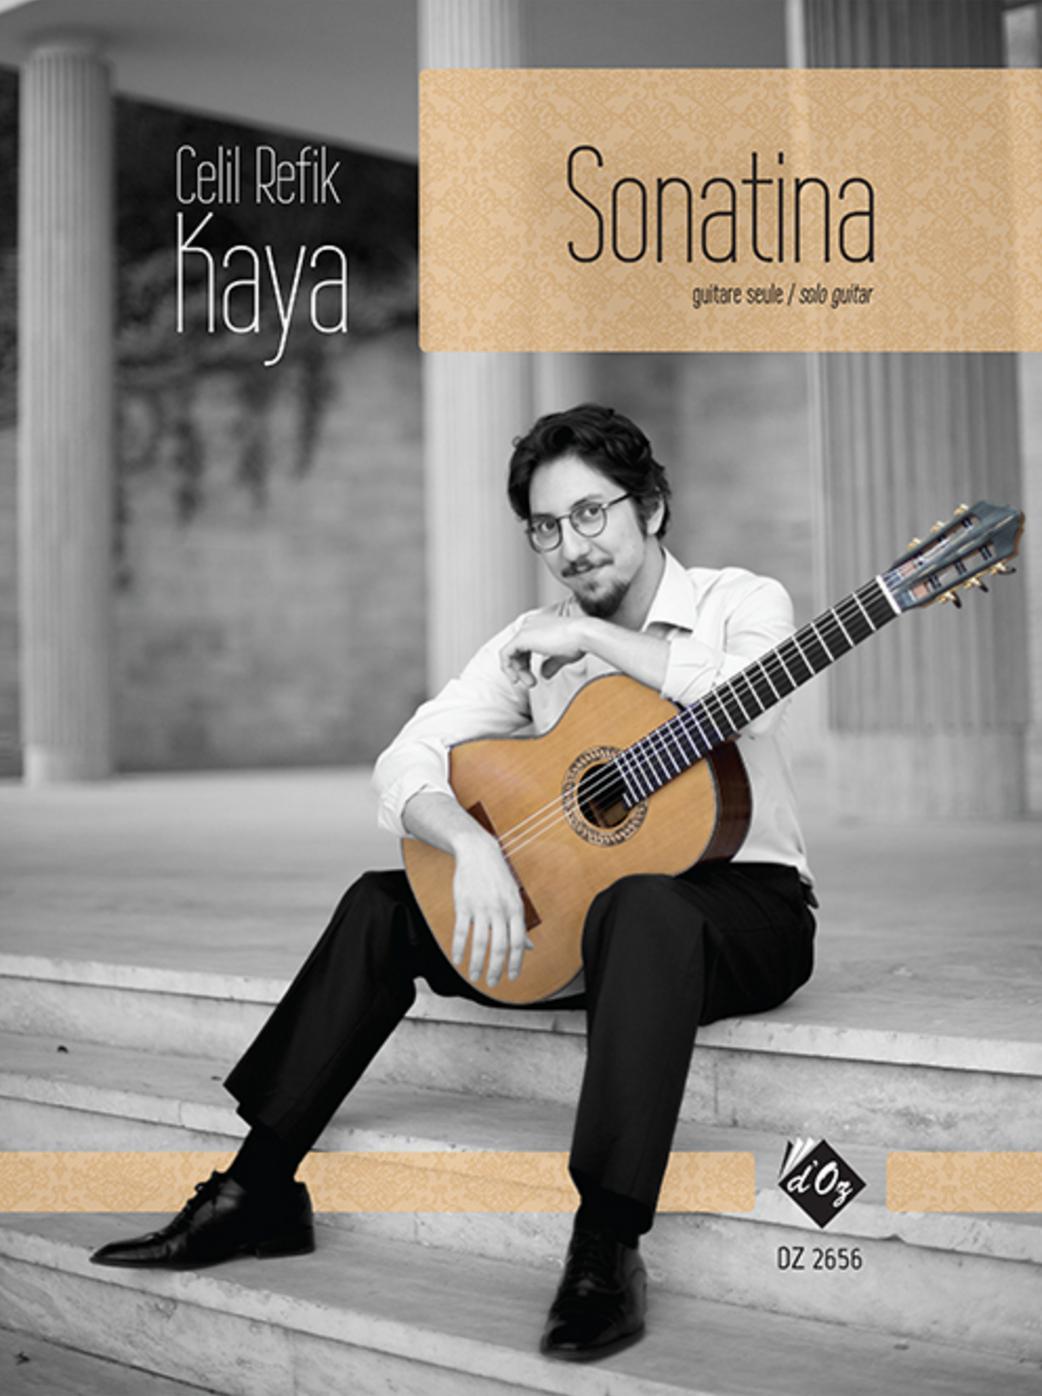 Sonatina for solo guitar Composer : Celil Refik Kaya To Adam Holzman Published: Les Productions d'OZ